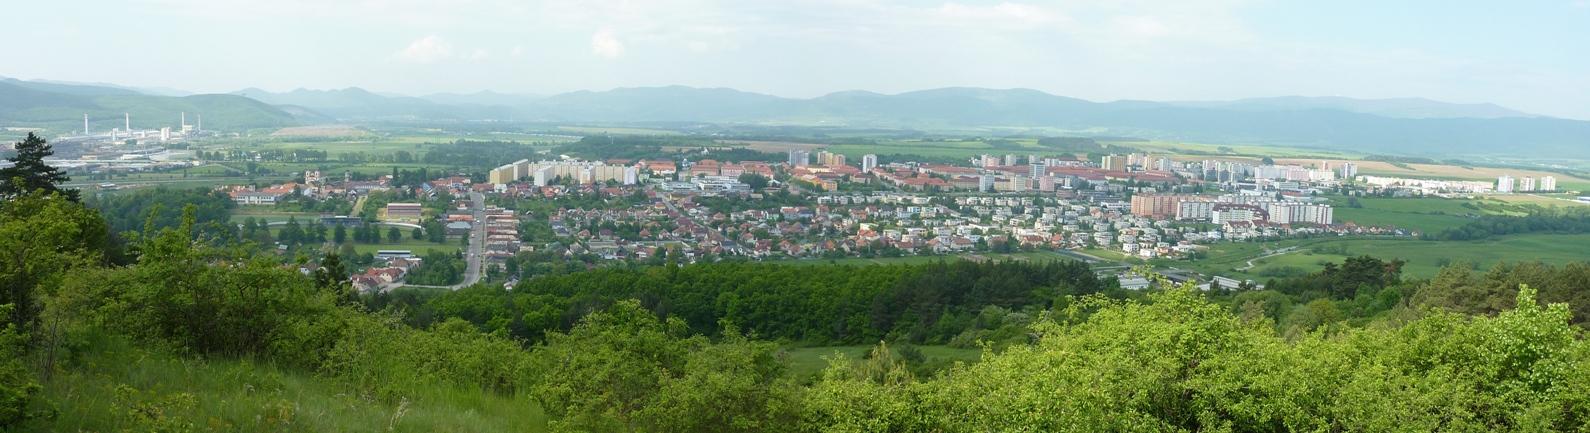 Smart city Ziar nad Hronom